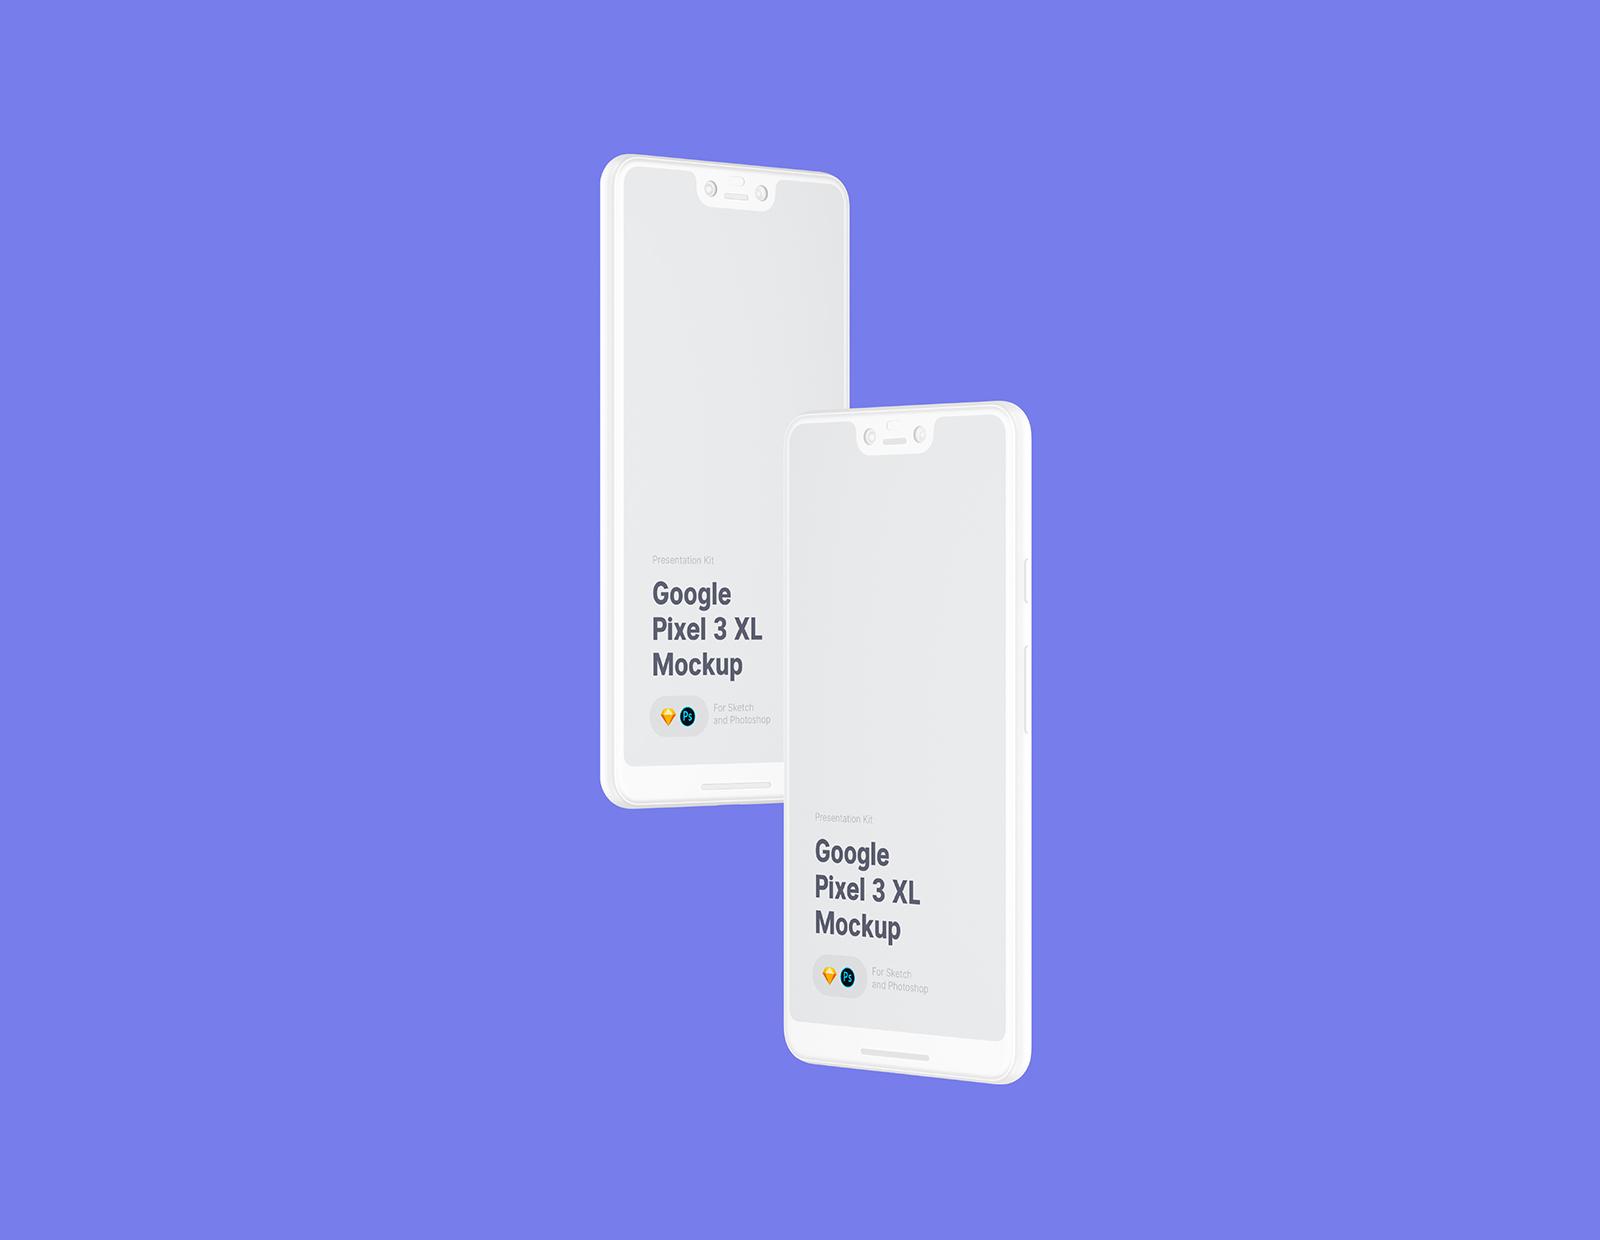 Free Google Pixel 3 XL Mockup